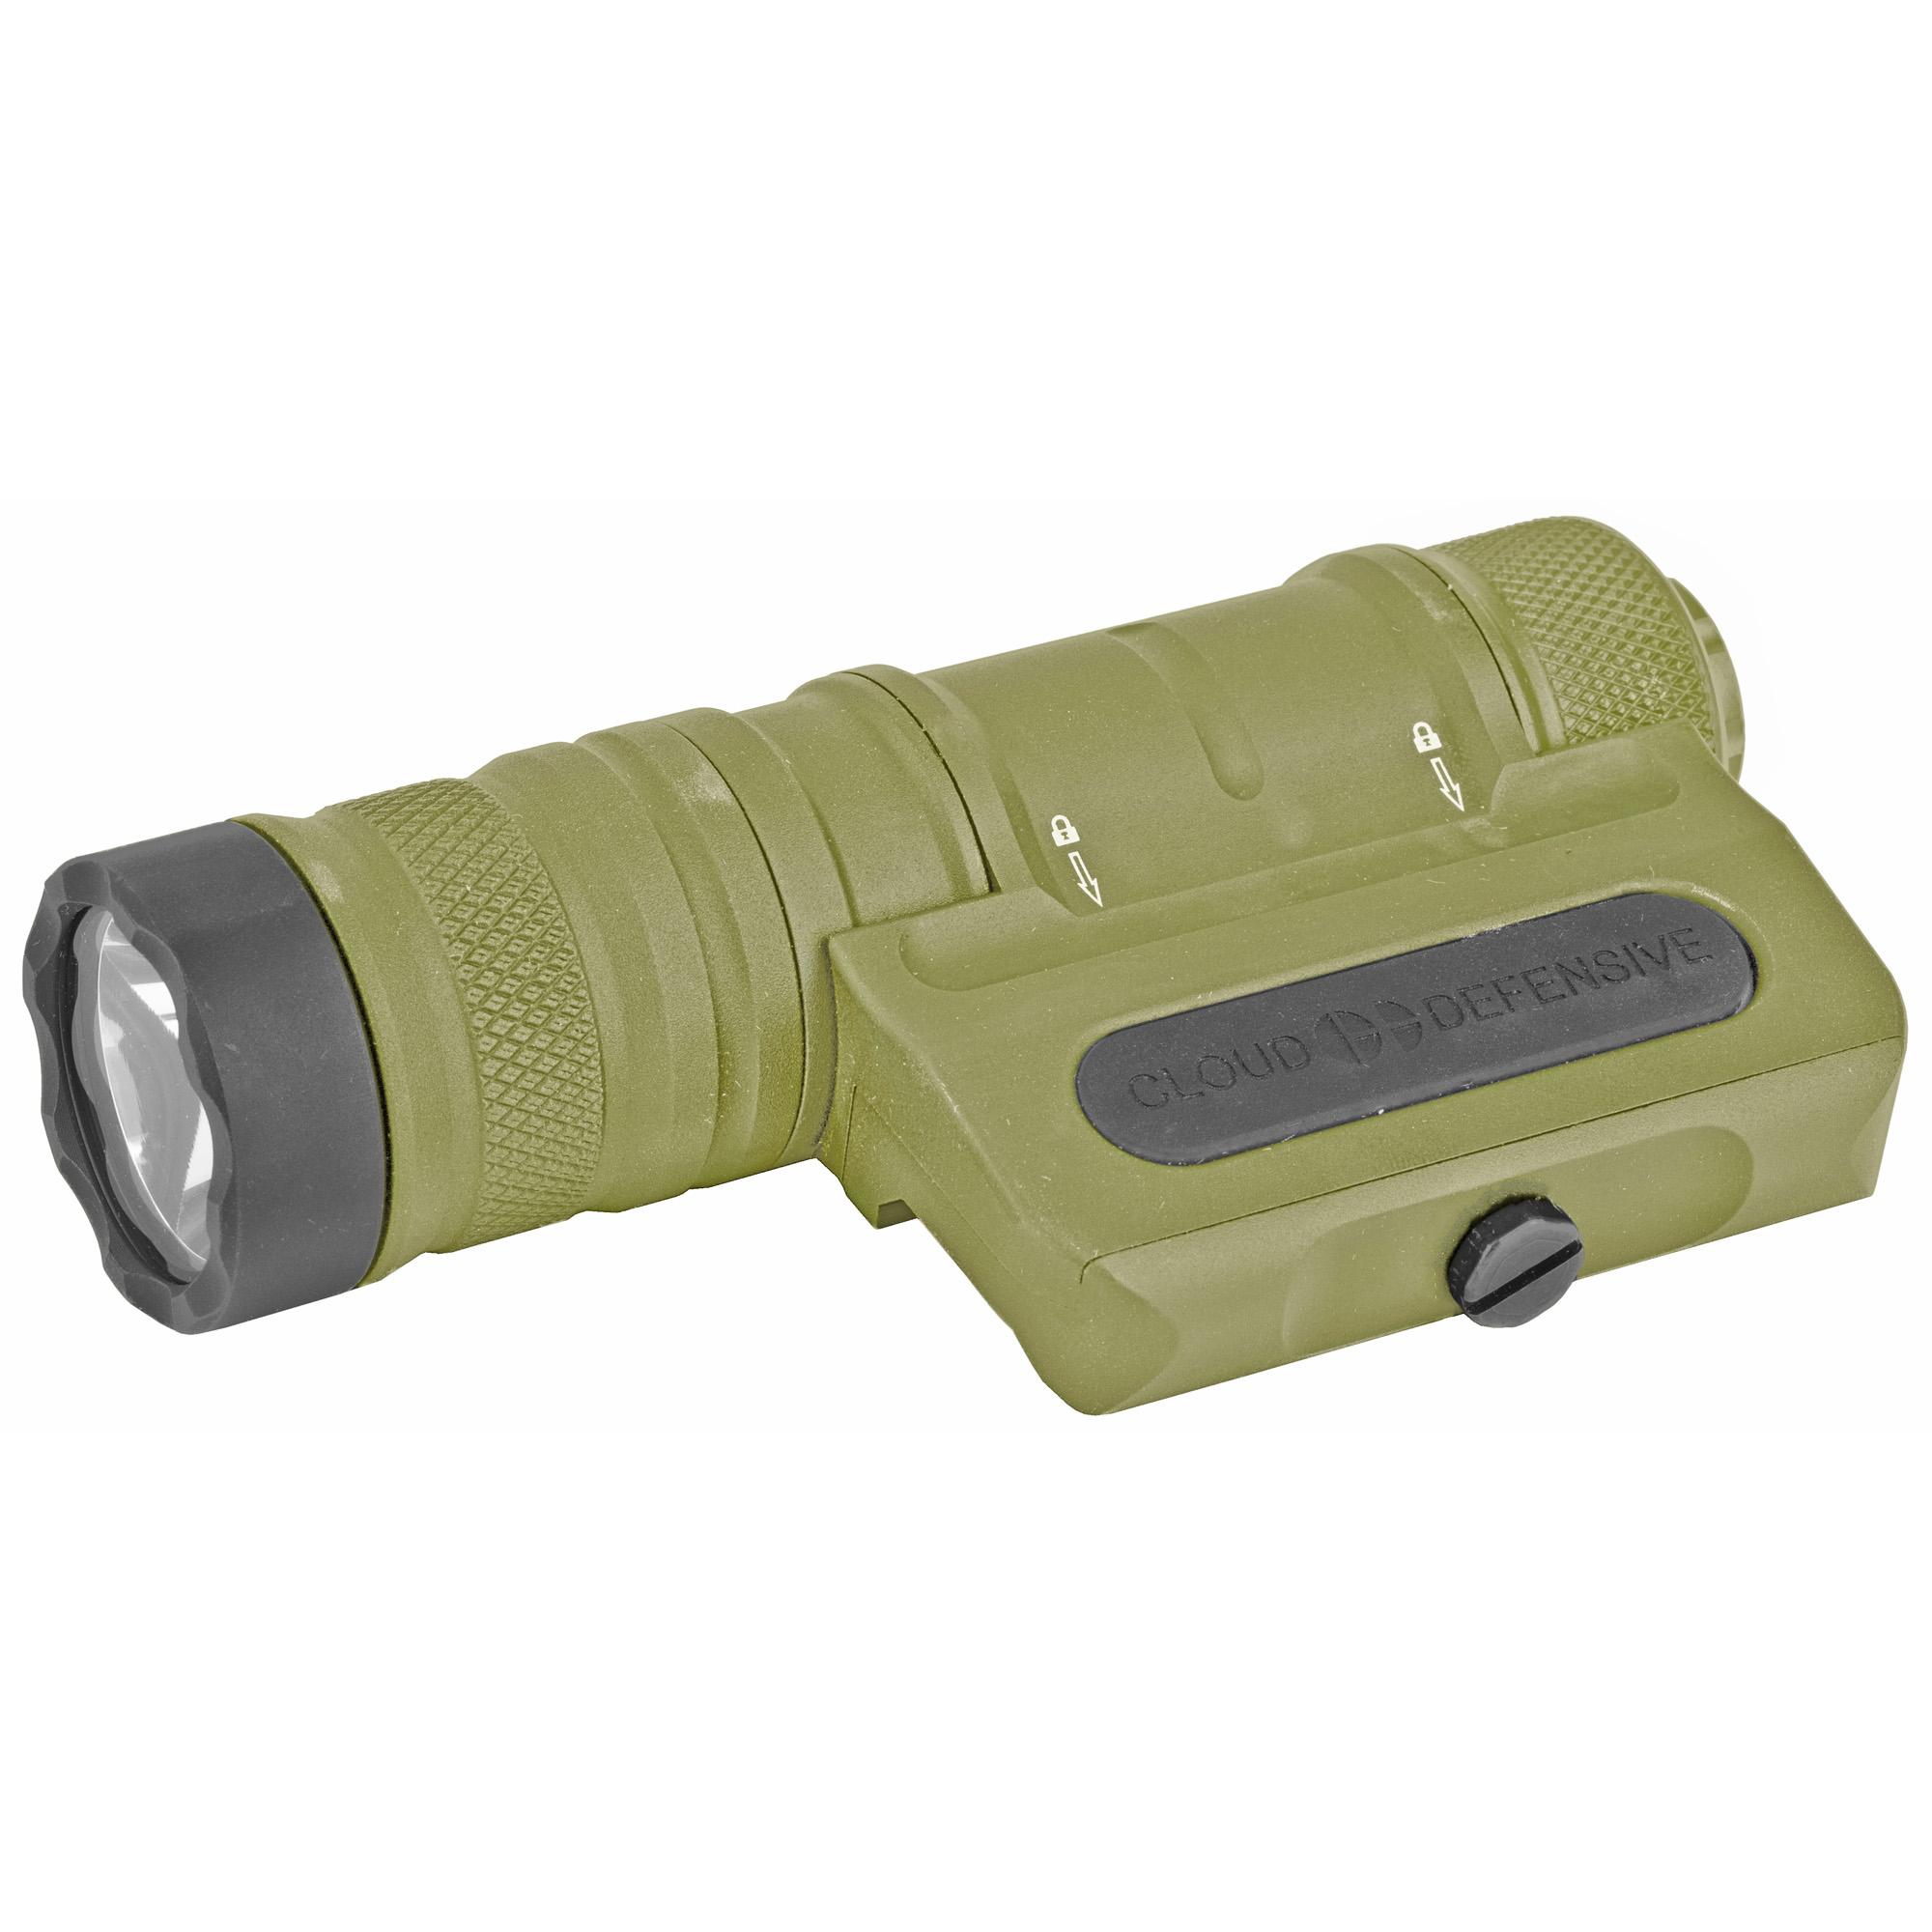 Cld Def Owl Kit Bazooka Green